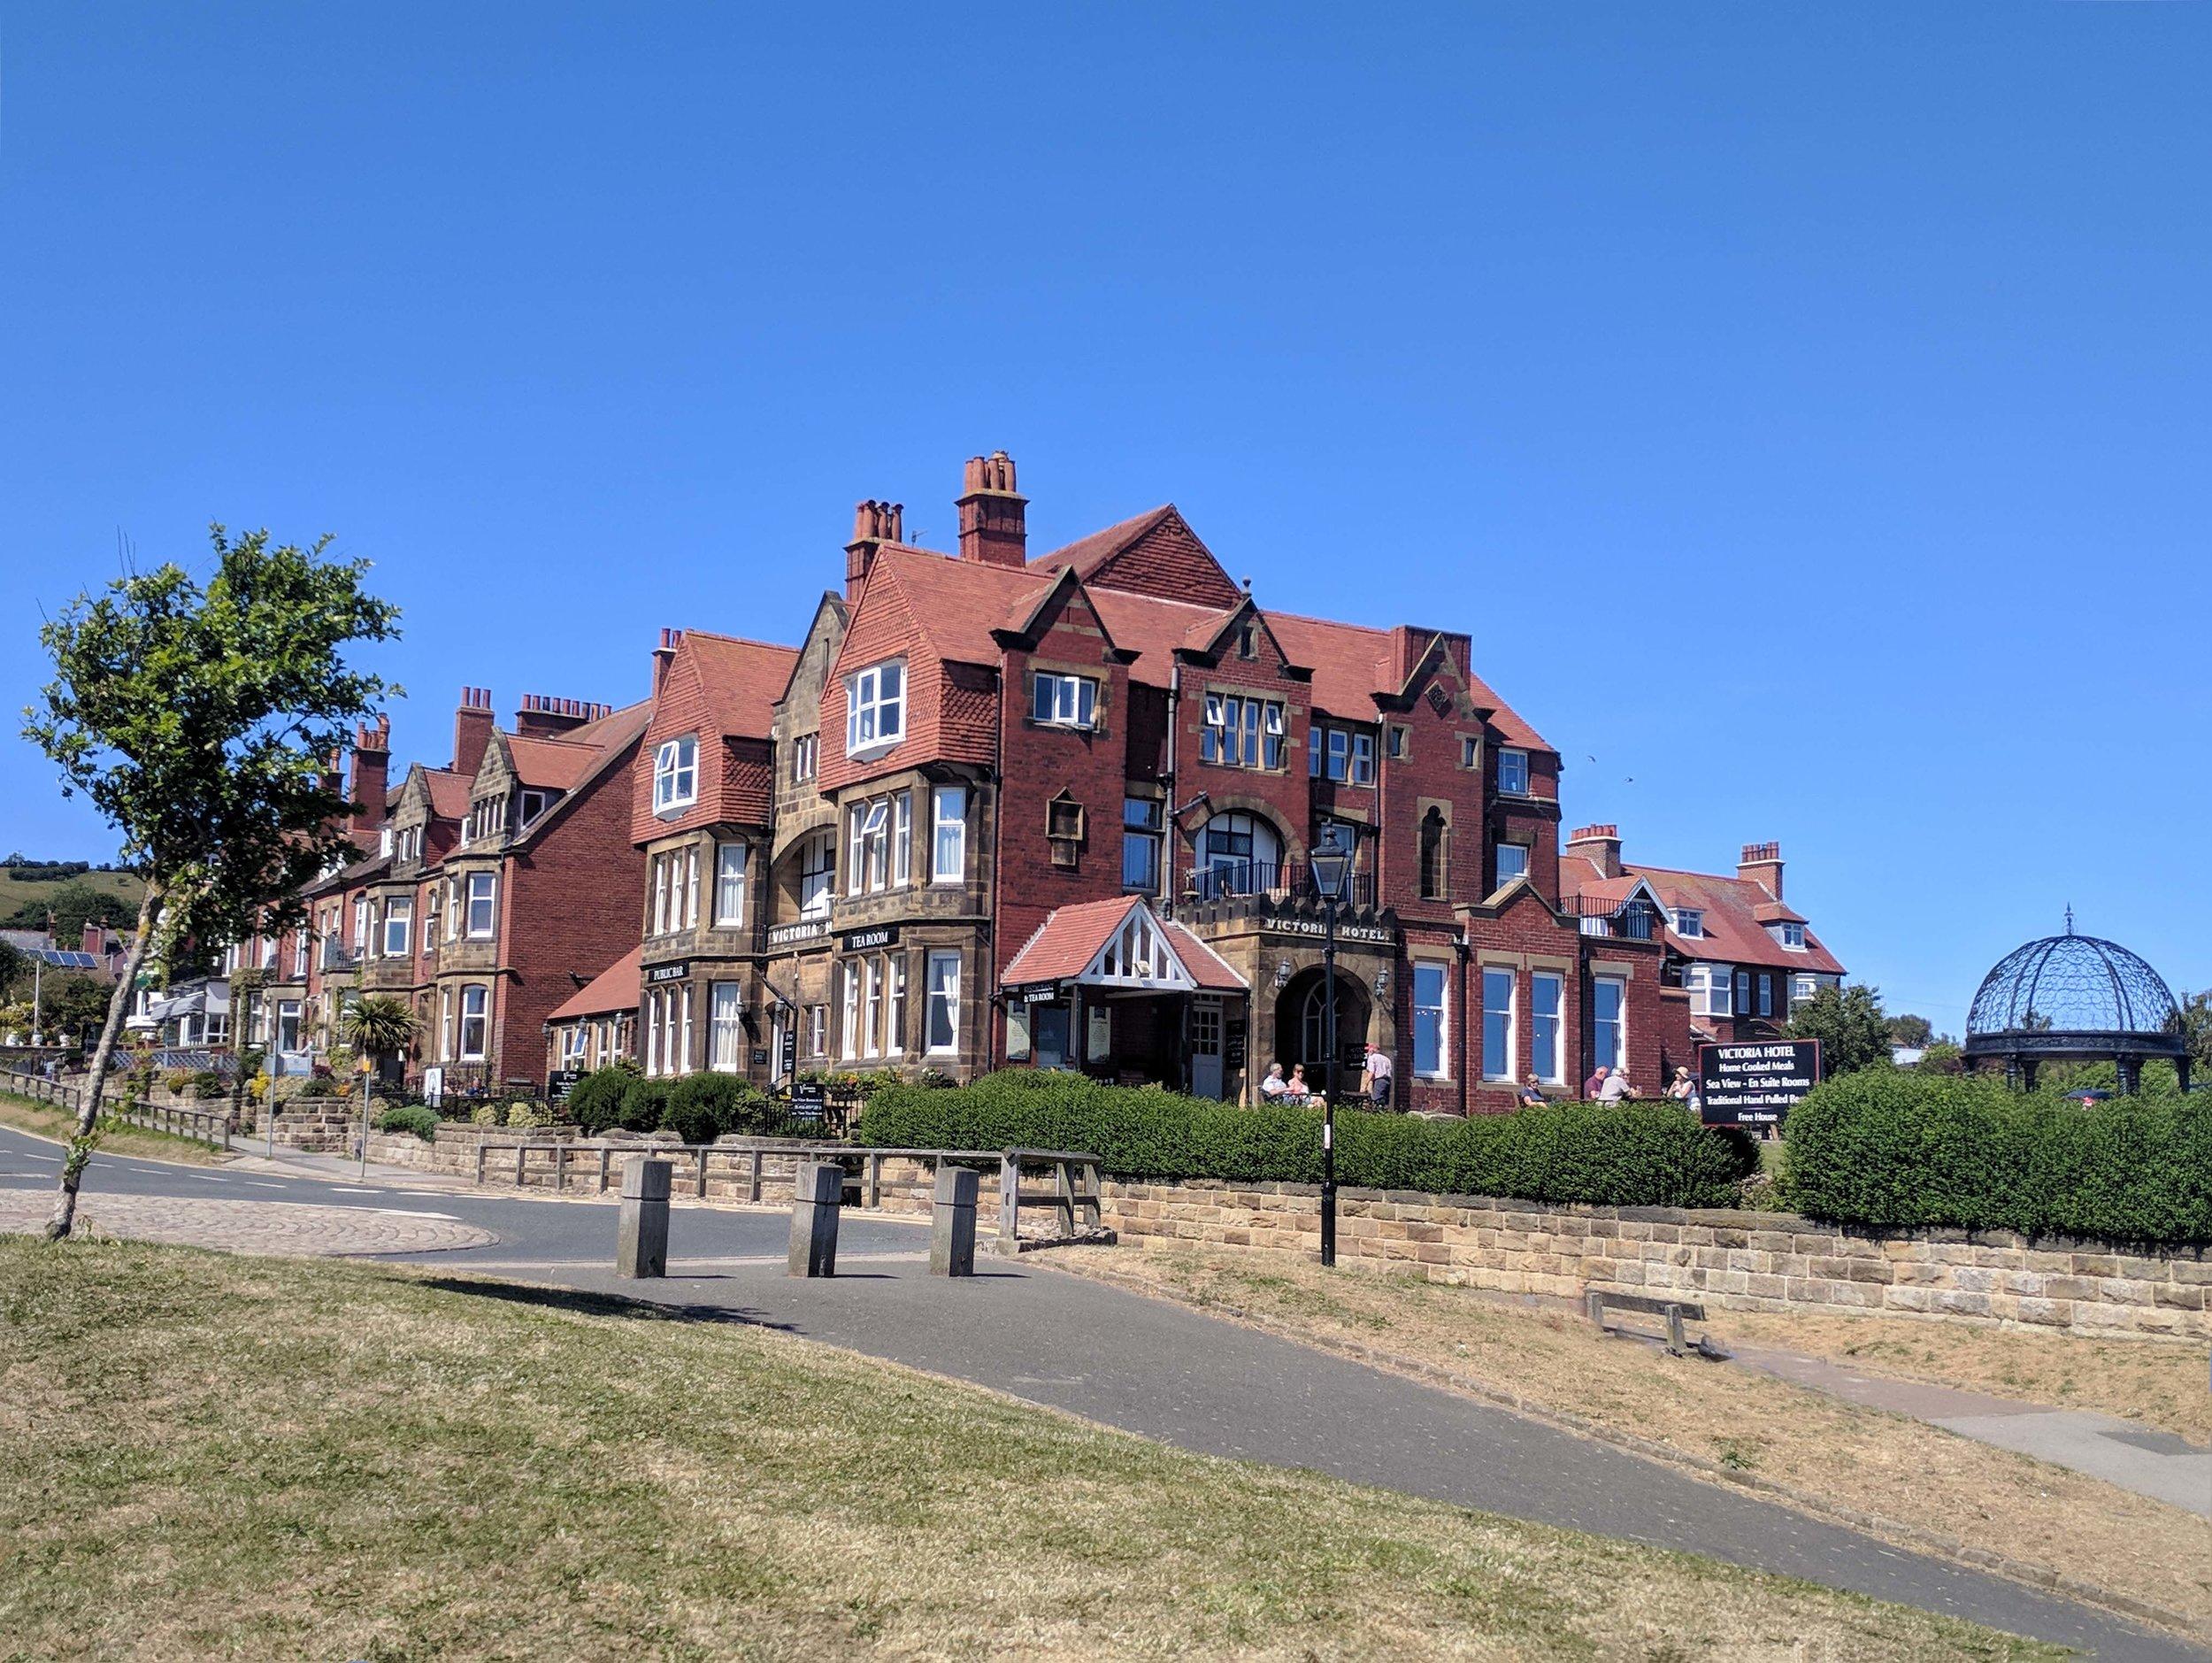 Splendid hotel in Robin Hoods Bay